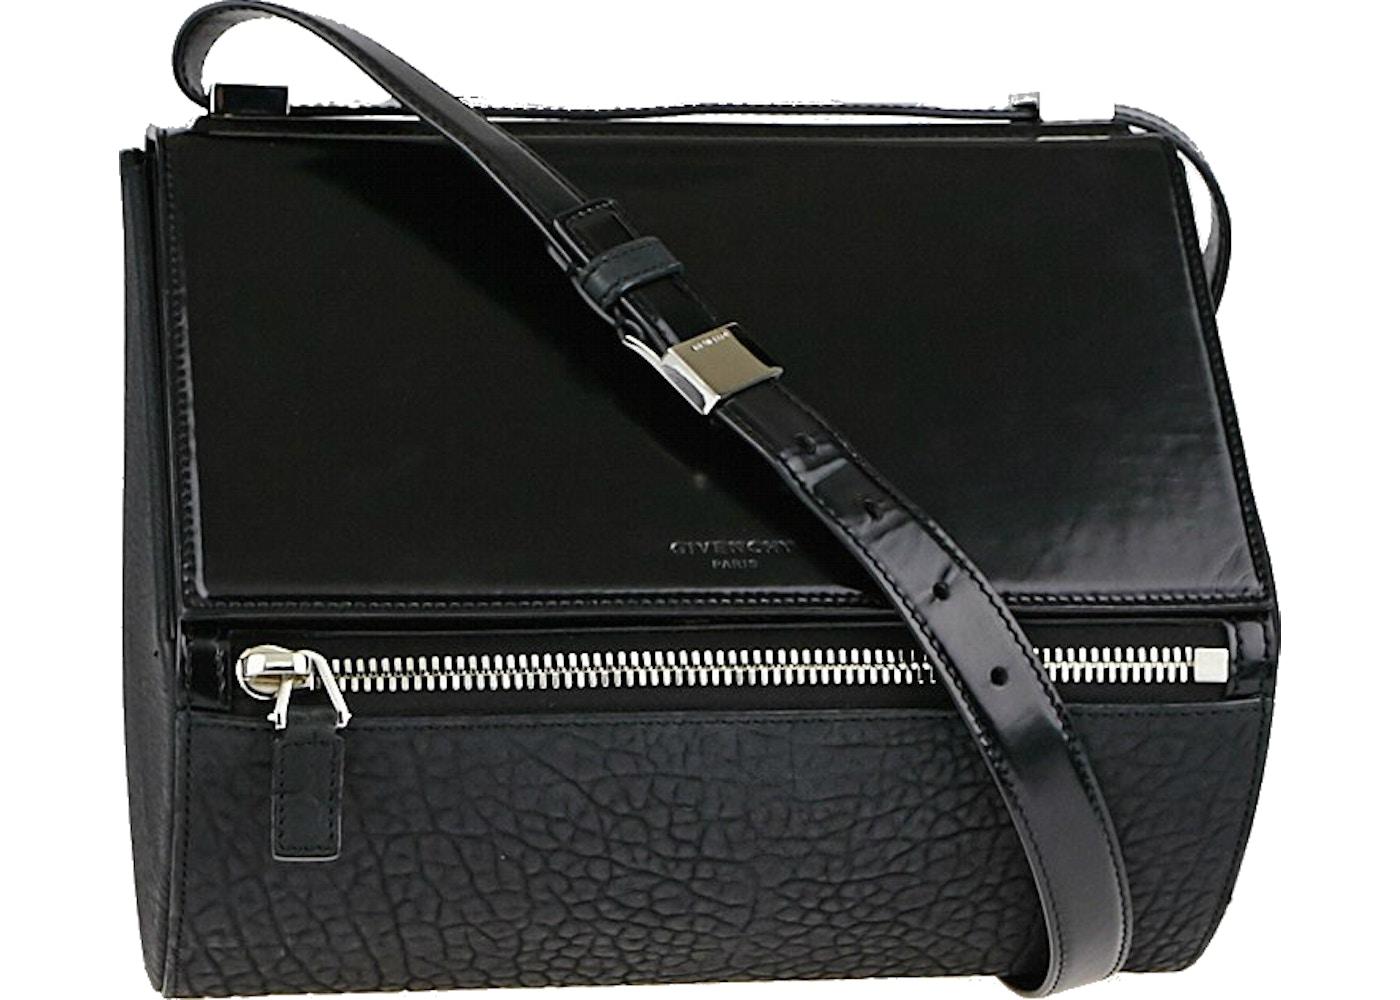 3714b87c01fb Givenchy Pandora Shoulder Bag Grained Medium Black. Grained Medium Black